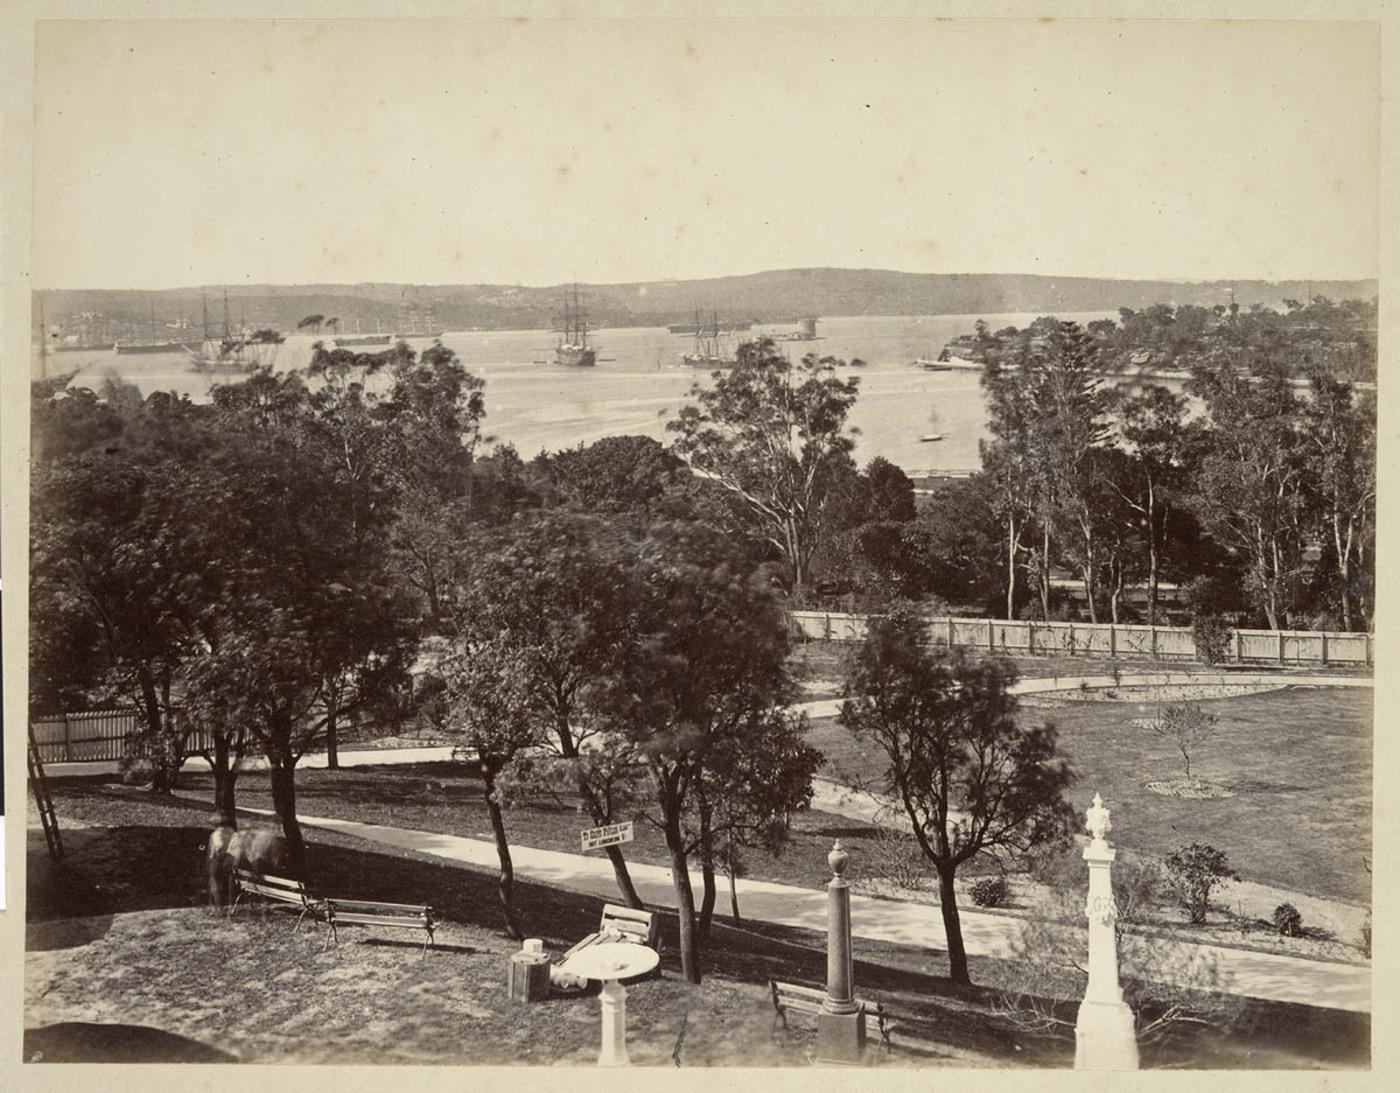 Garden Palace, 1879, by Tronier Artist Photographer